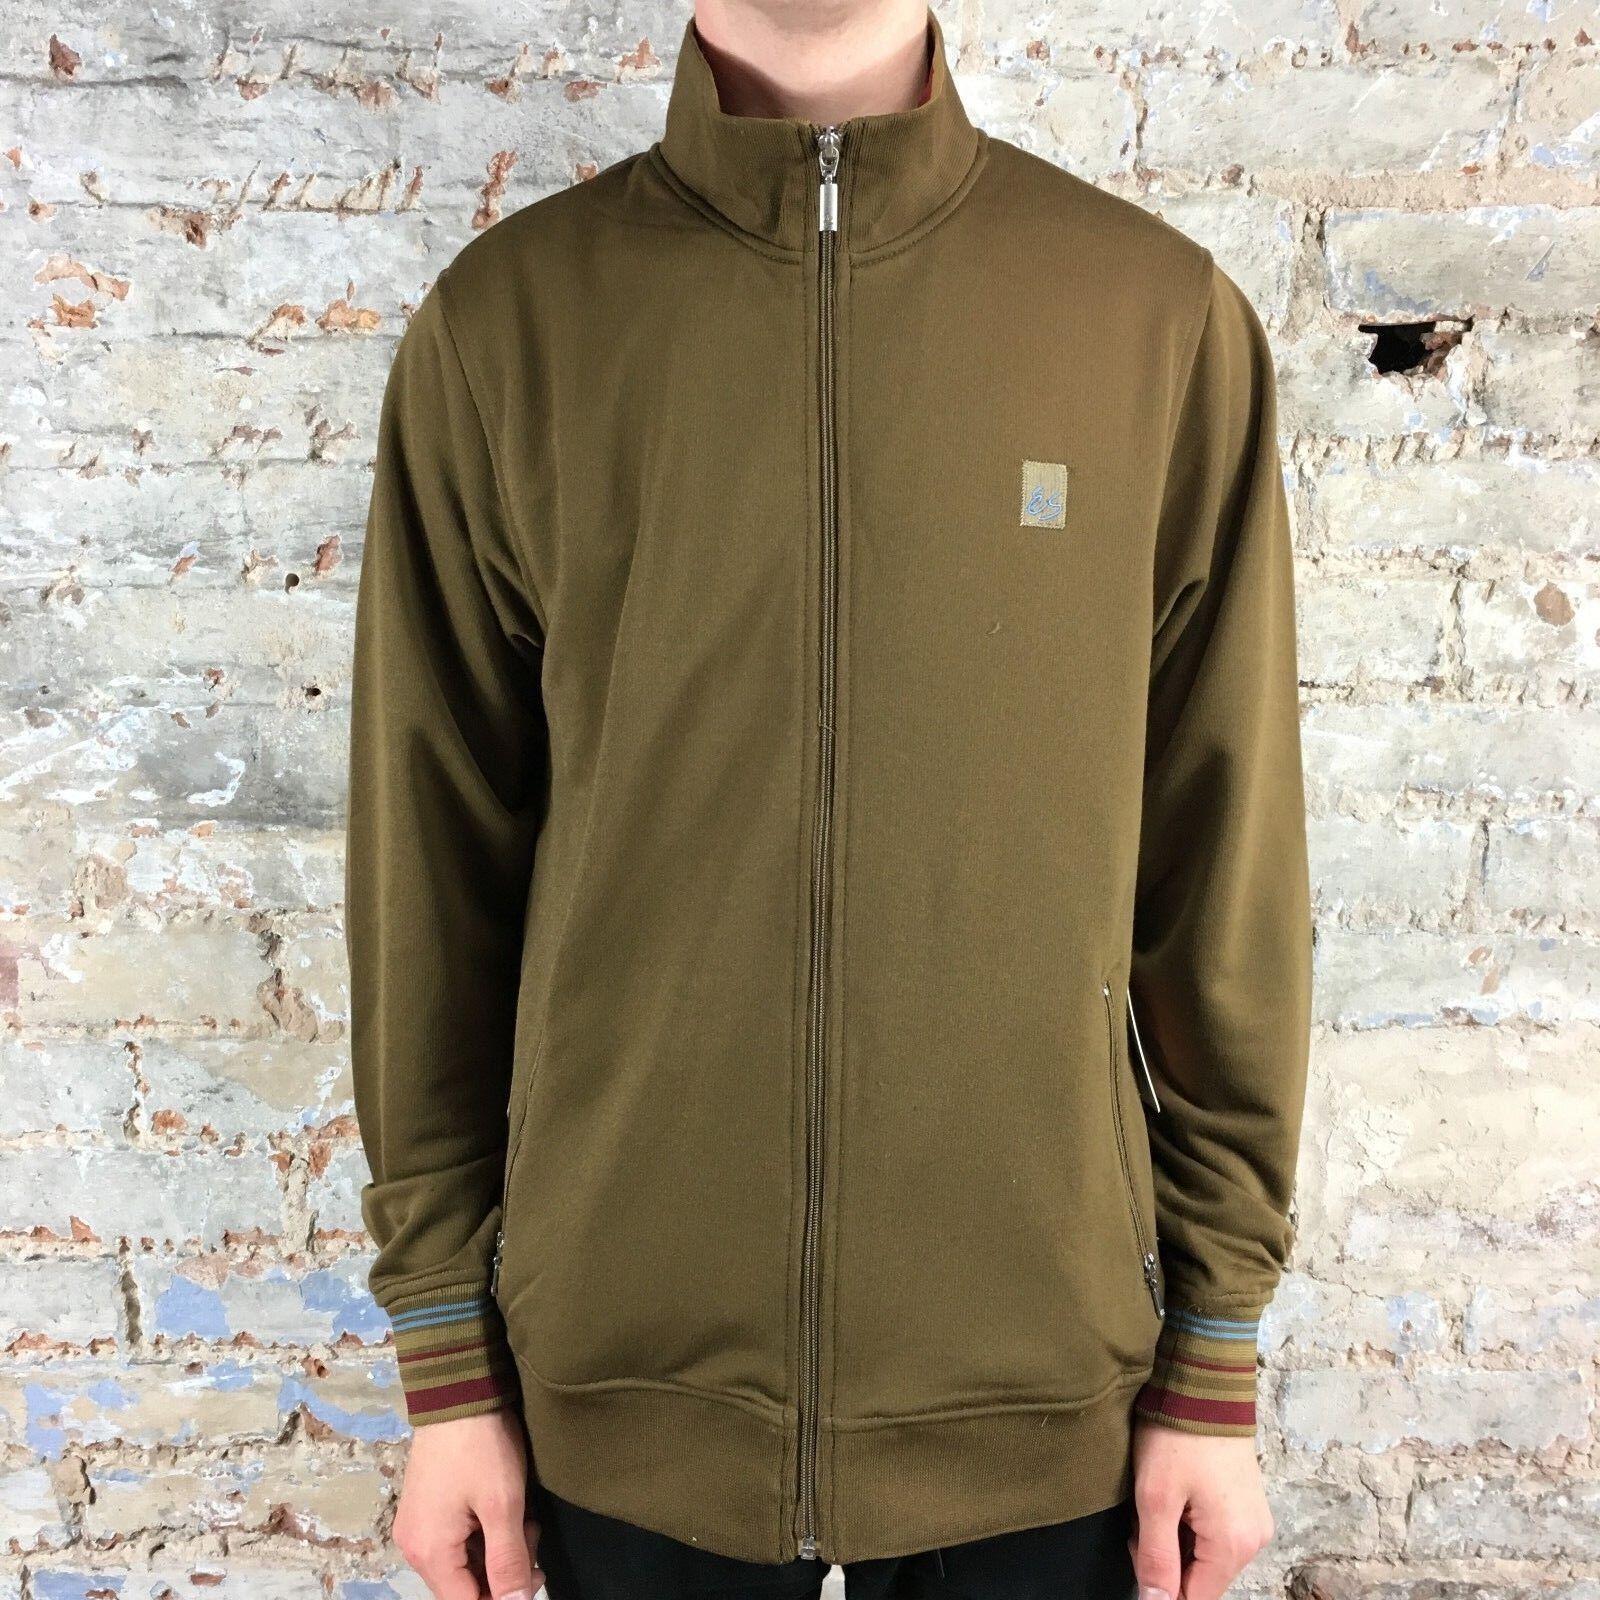 ES Granville MNS Track Jacket Brown Brand New Size S,M